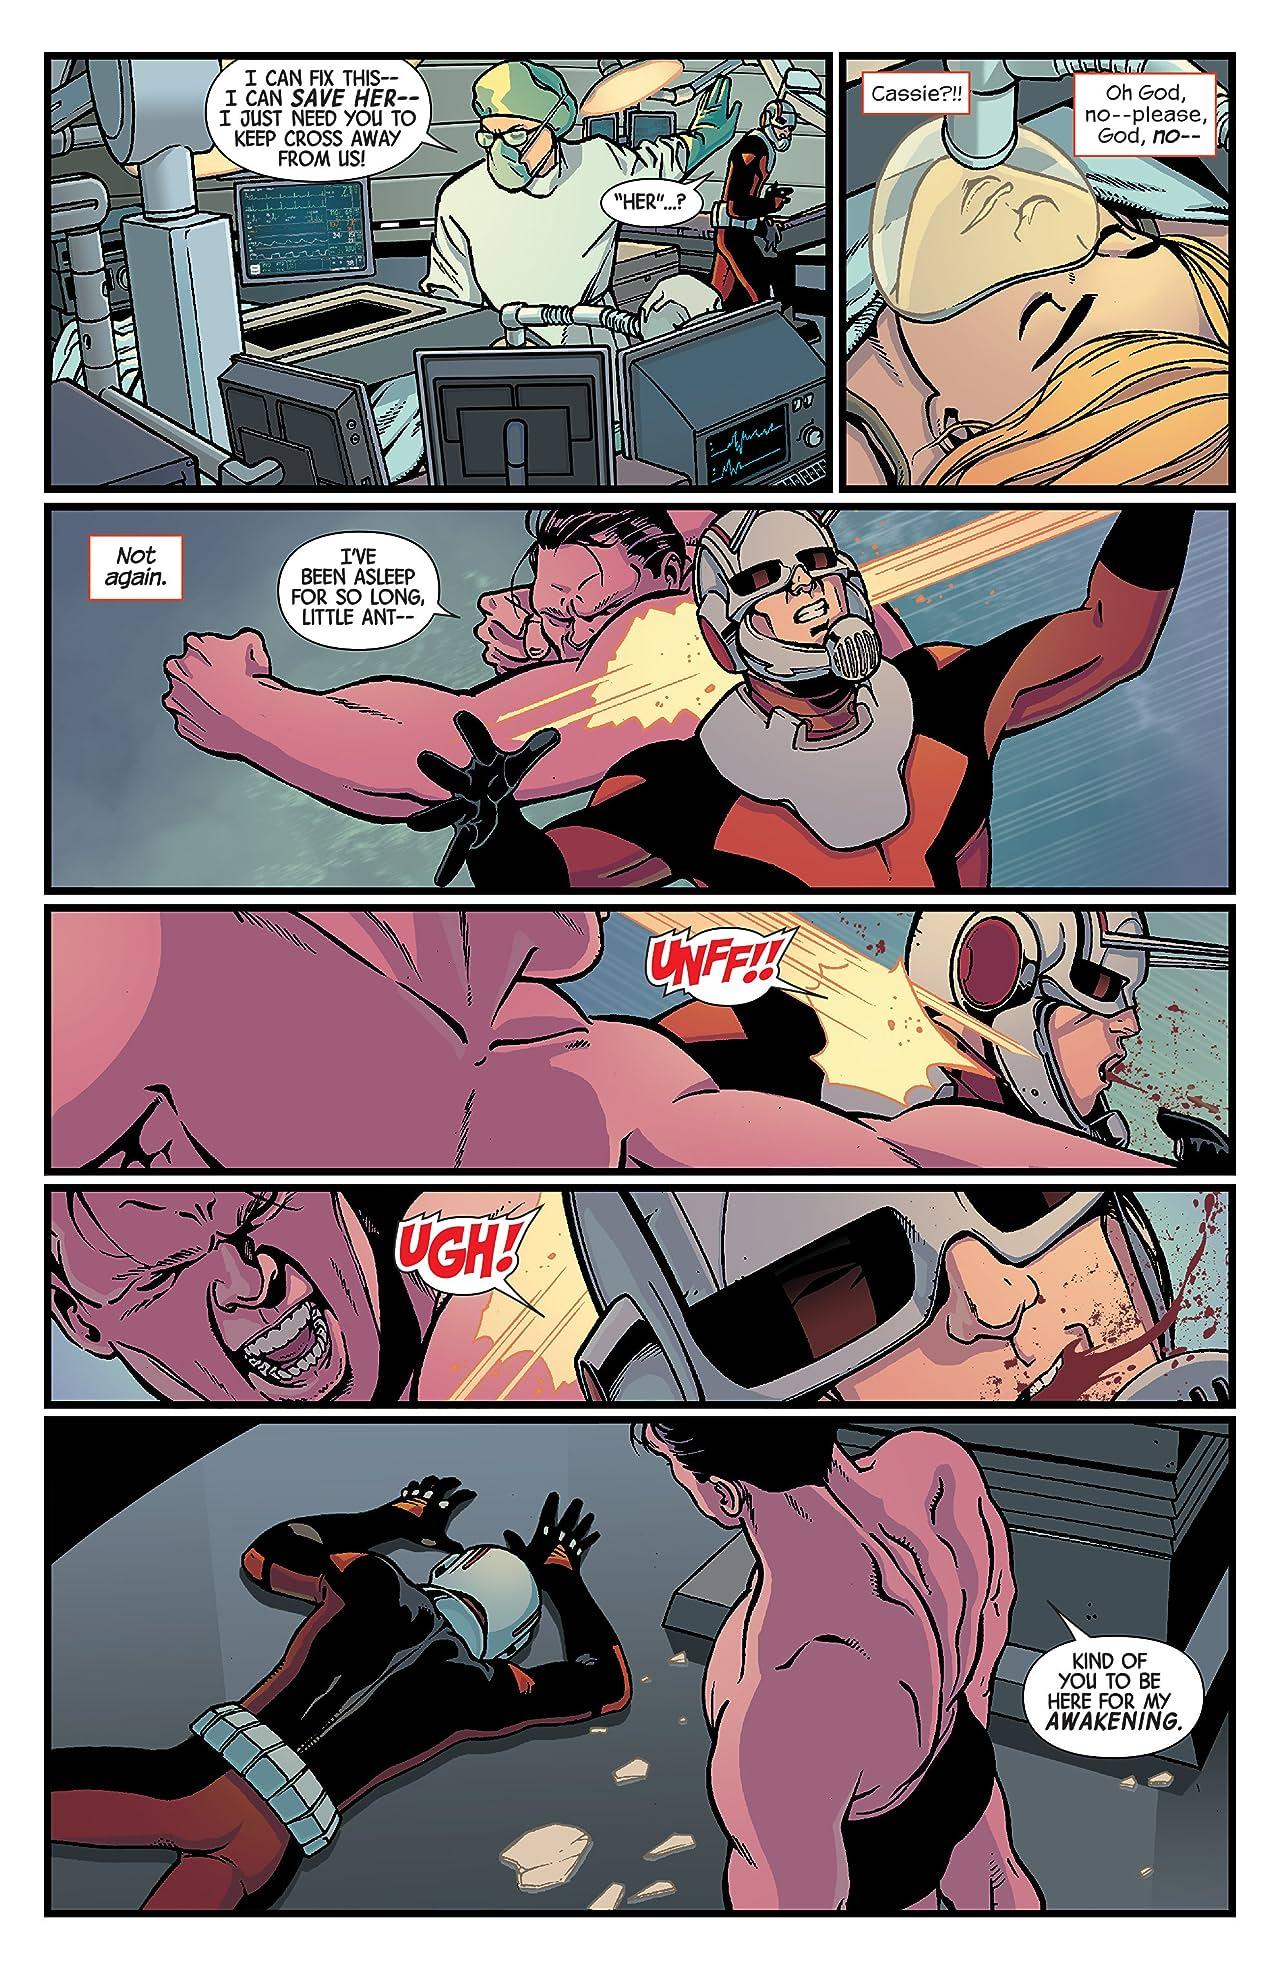 Ant-Man (2015) #5